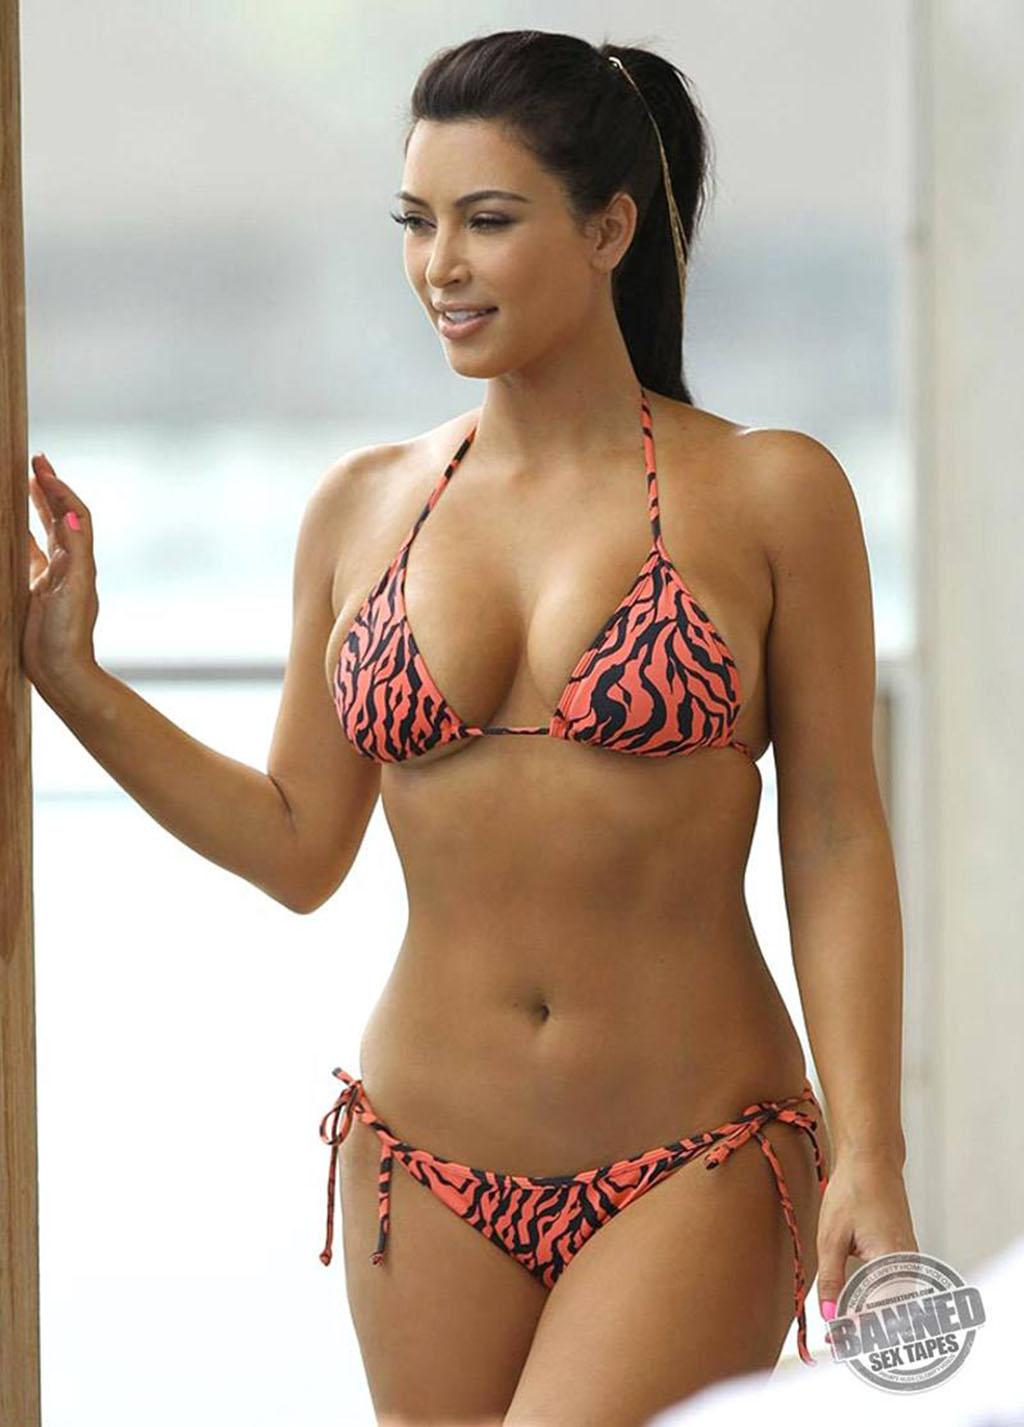 Kim-Kardashian-underware 1024x